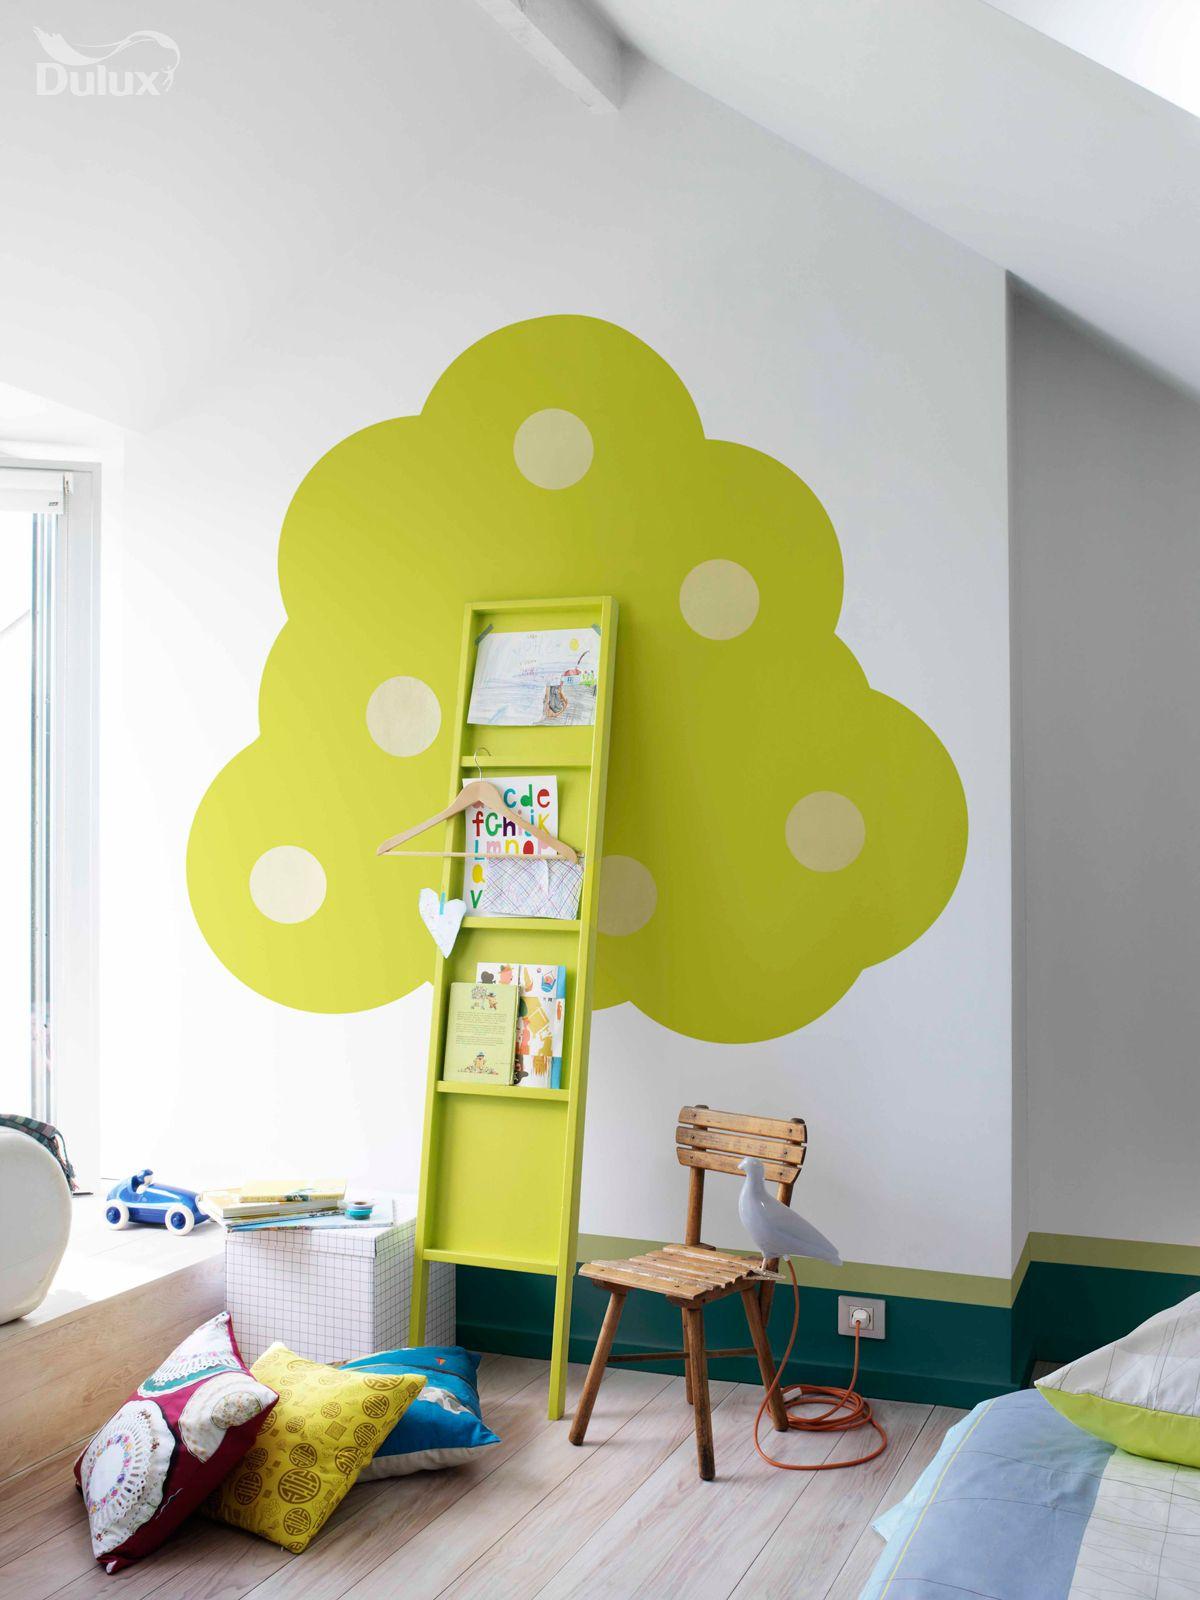 Diy Bookshelf Tree  So Sweet For A Childs Room